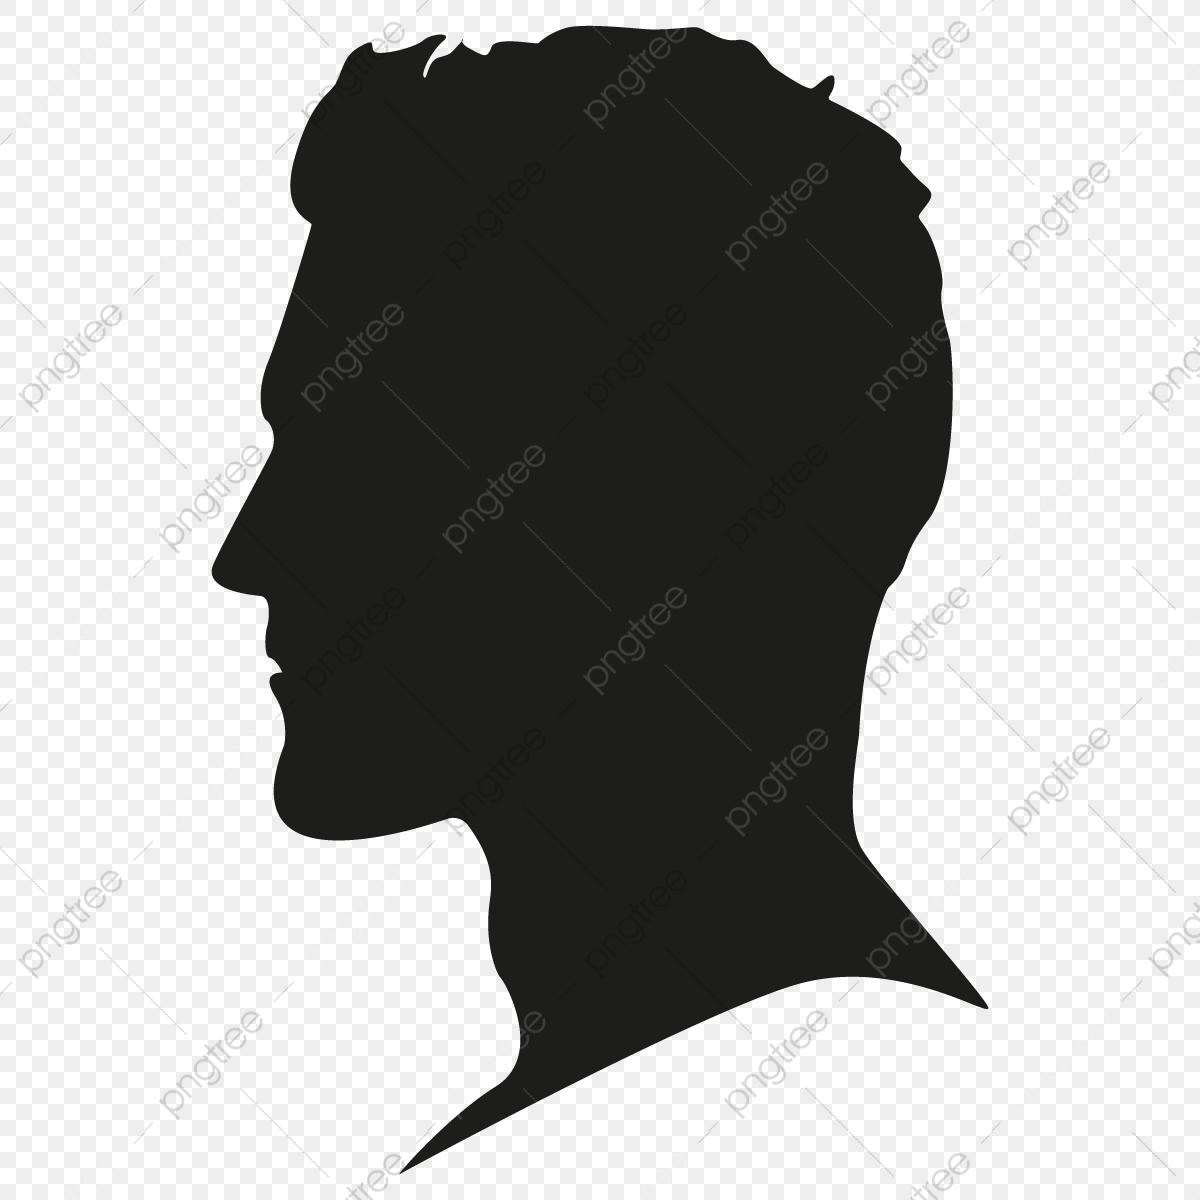 Male Silhouette Head Vector Png Free, Male Silhouette Head, Person.